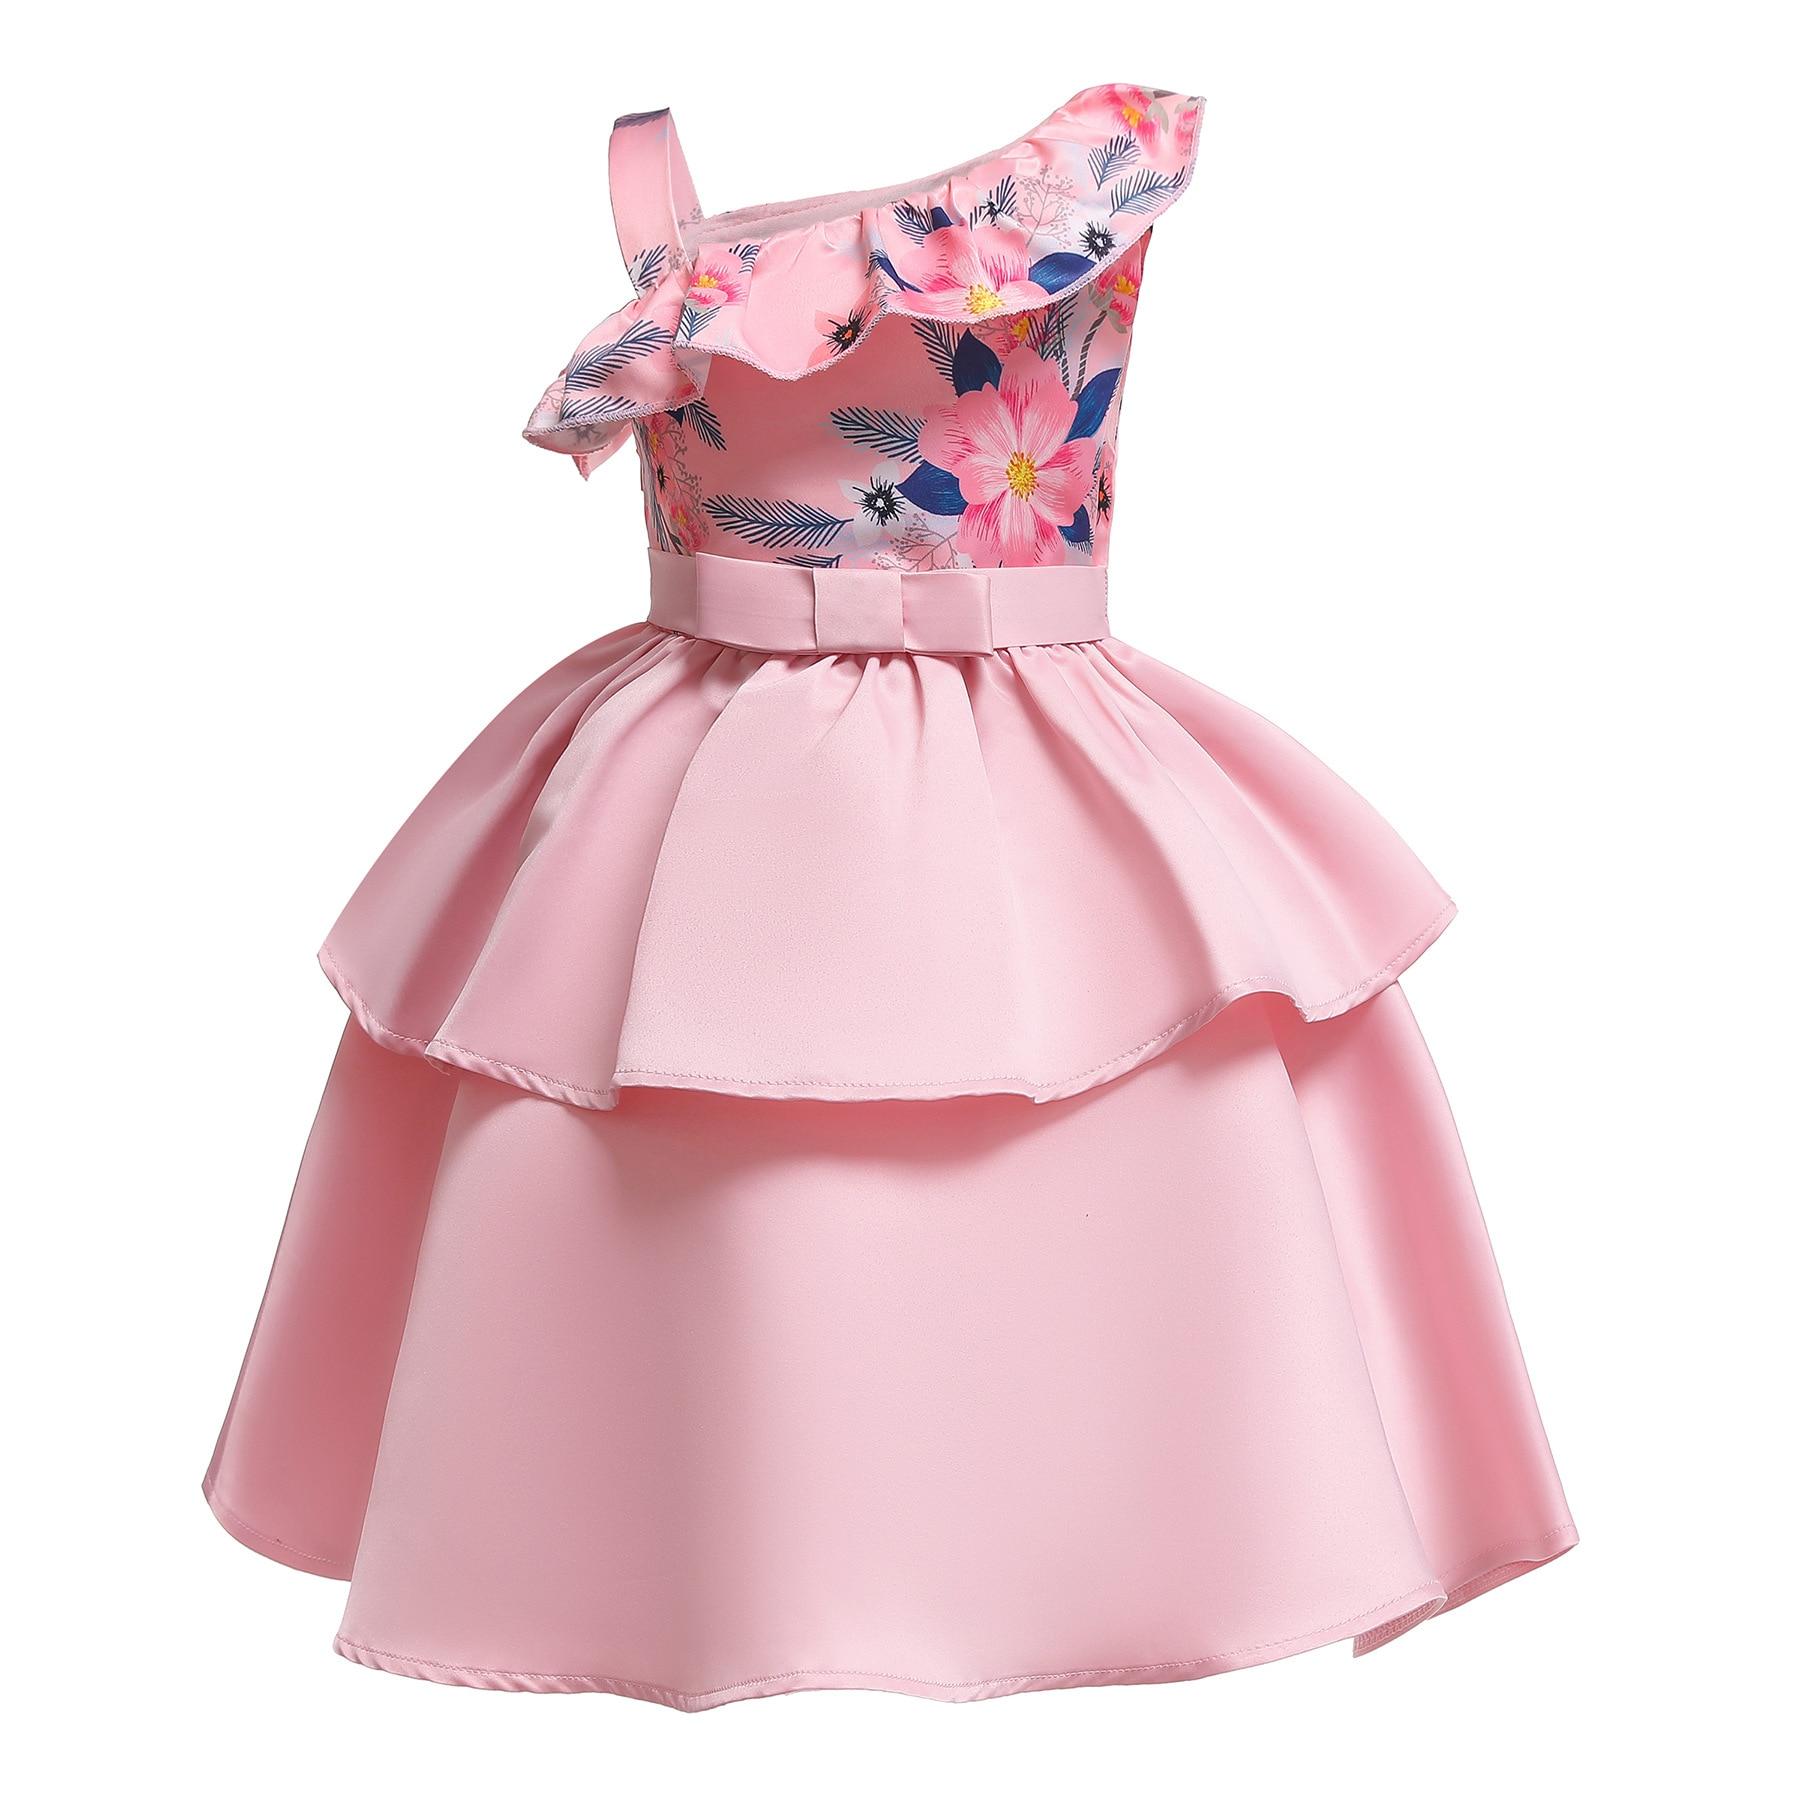 c4c8d1883b1 Baby Tutu Princess Dresses for Girls Formal Flower Birthday Party Girl  Dress for Girls Prom Baby